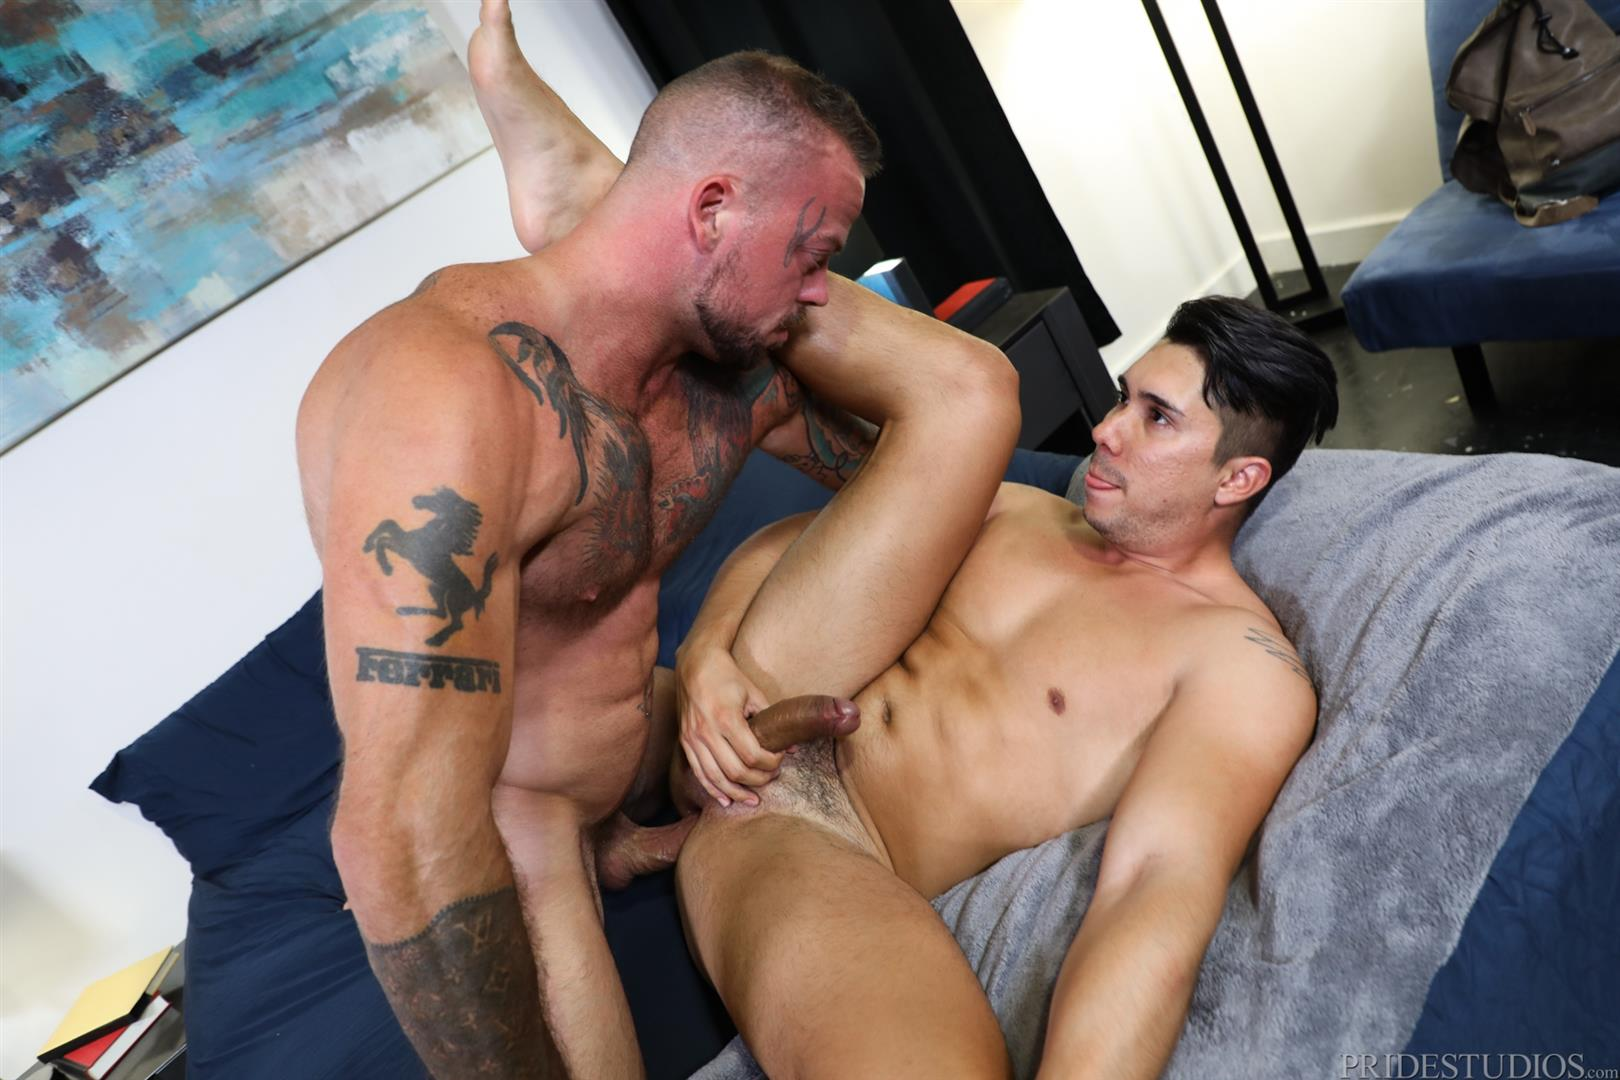 Pride-Studios-Sean-Duran-and-Adrian-Suarez-Muscle-Hunks-Bareback-Gay-Sex-Video-09 Muscle Hunk Sean Duran Breeding Adrian Suarez